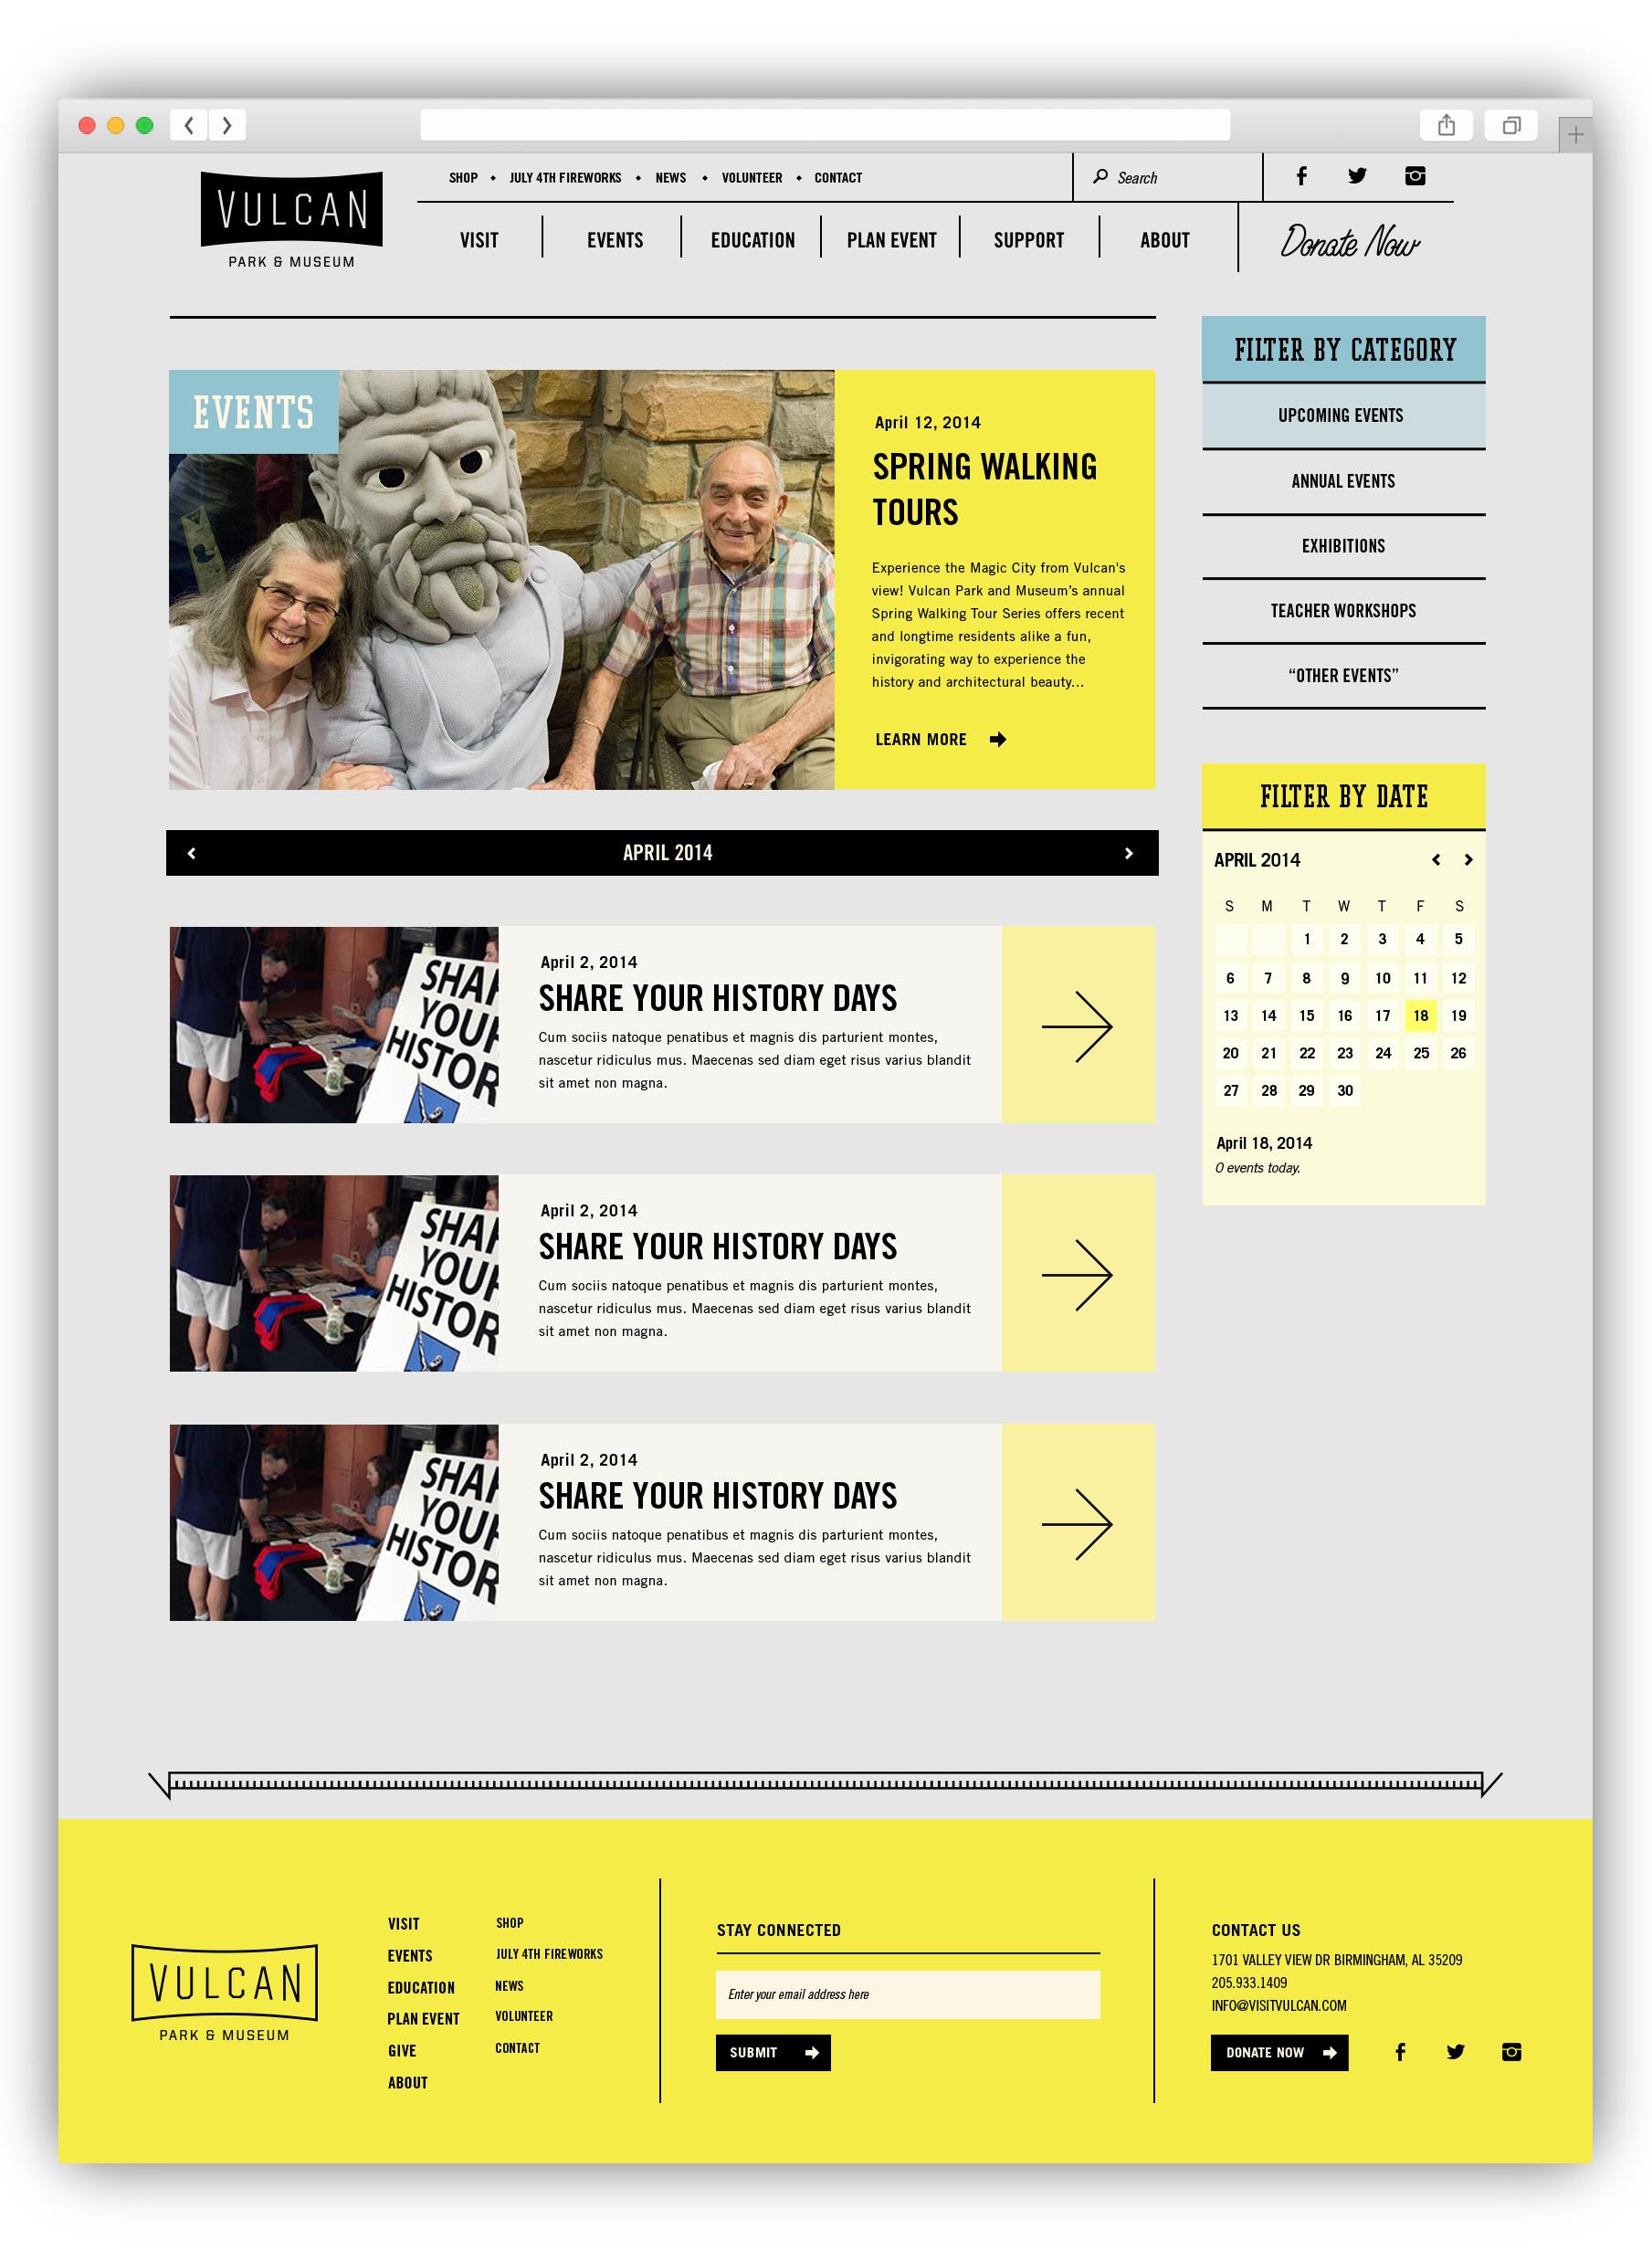 VULCAN-WEBSITE-events-landing